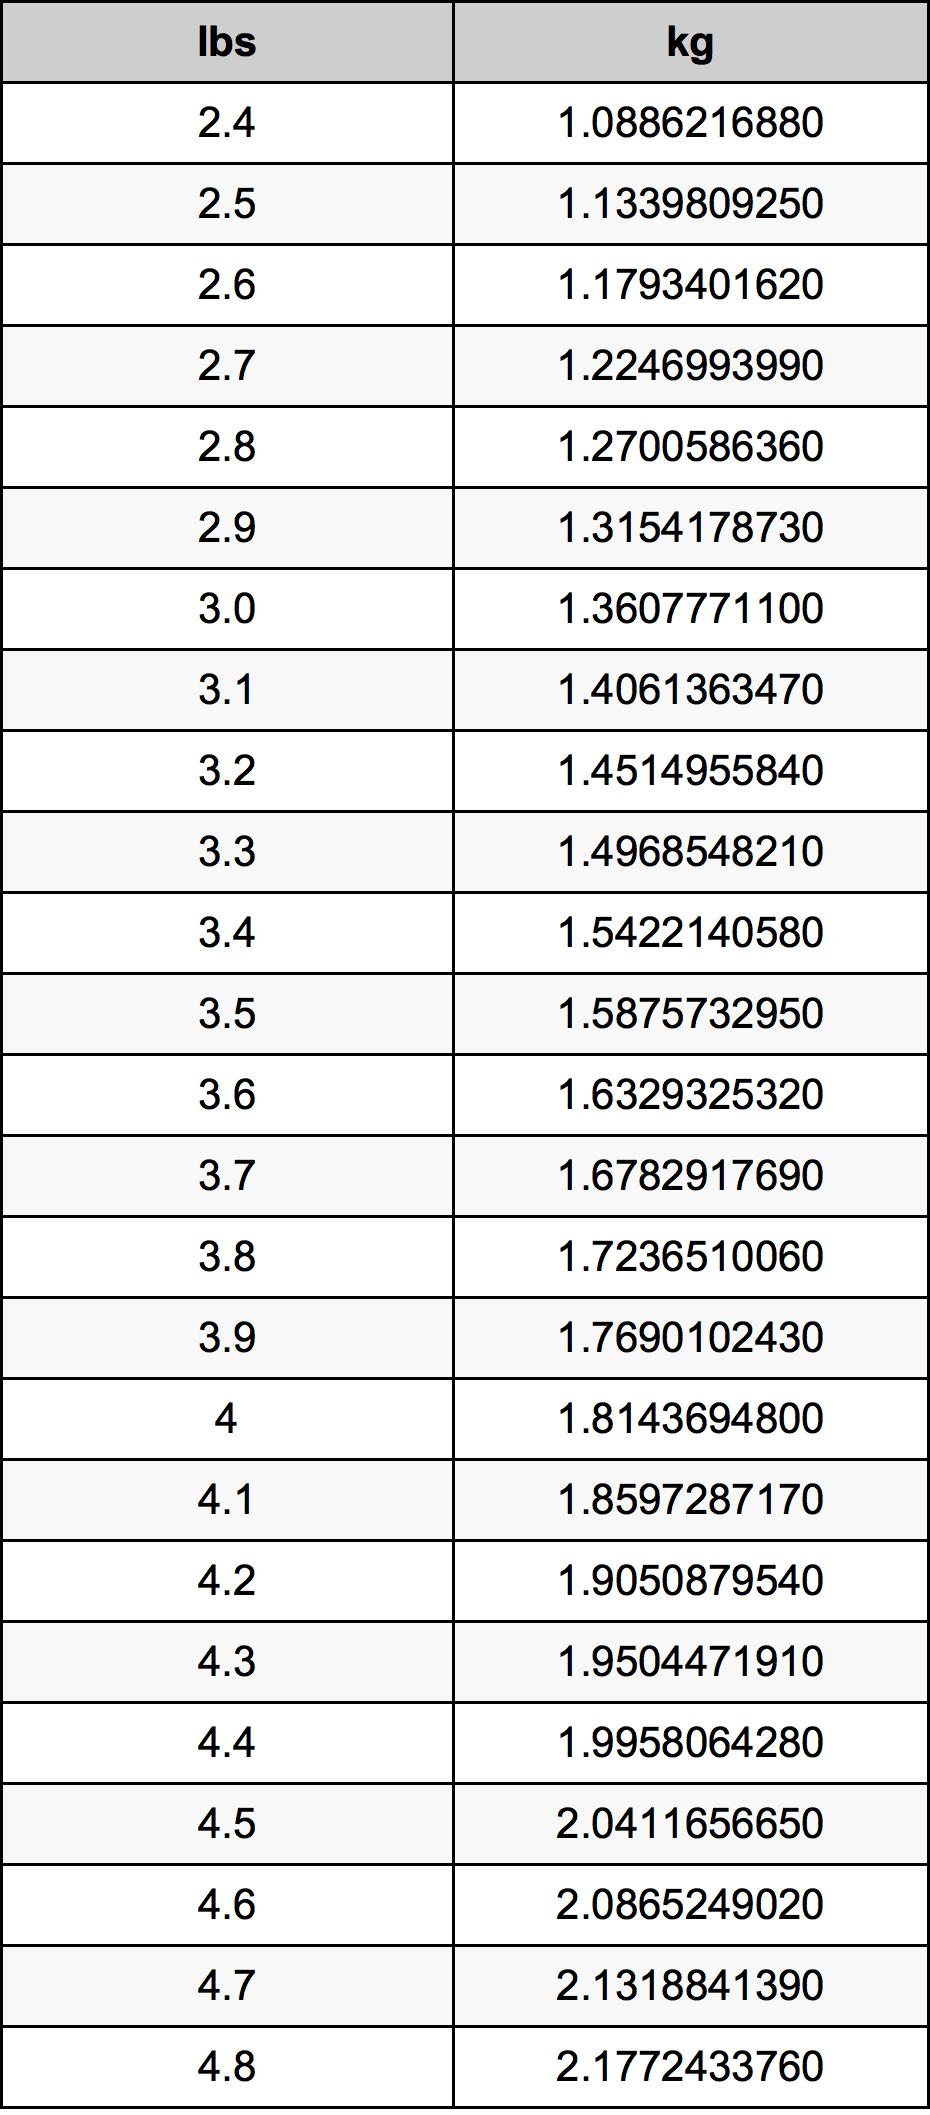 3.6 Pon konversi tabel